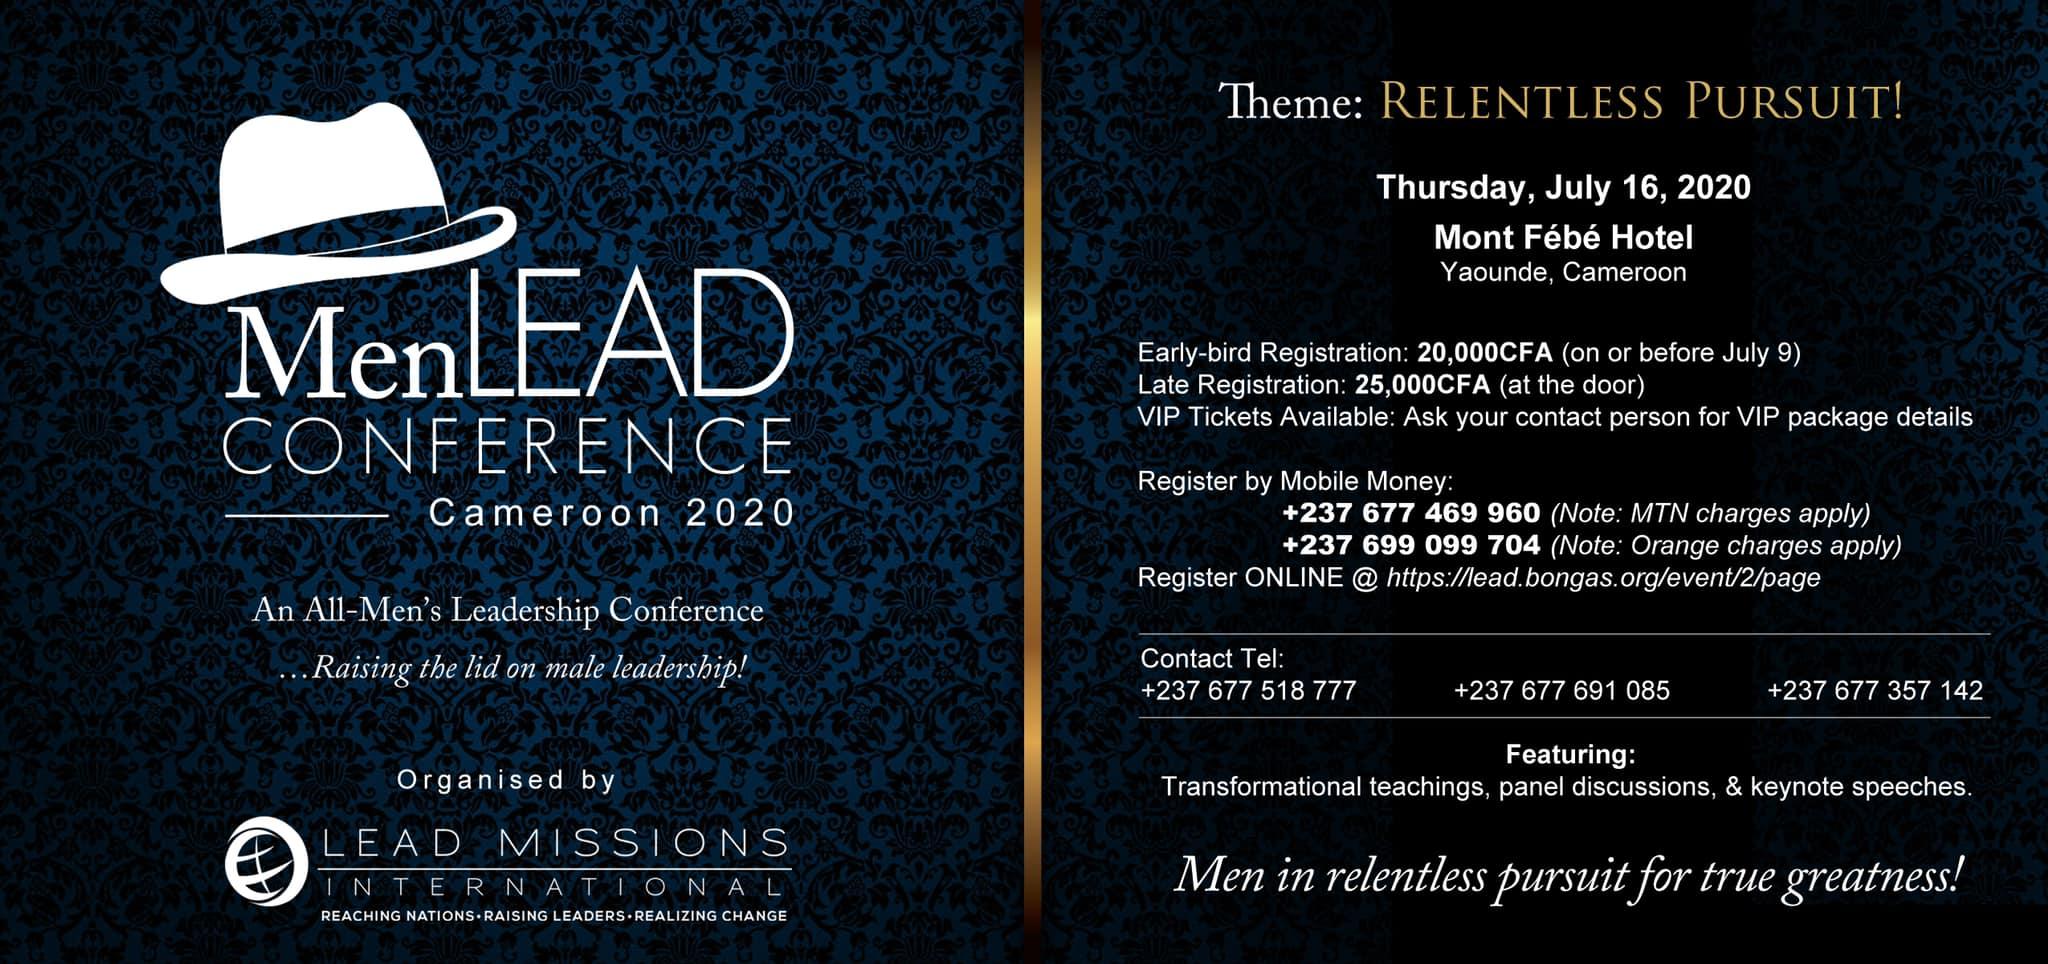 MenLEAD Conference 2020